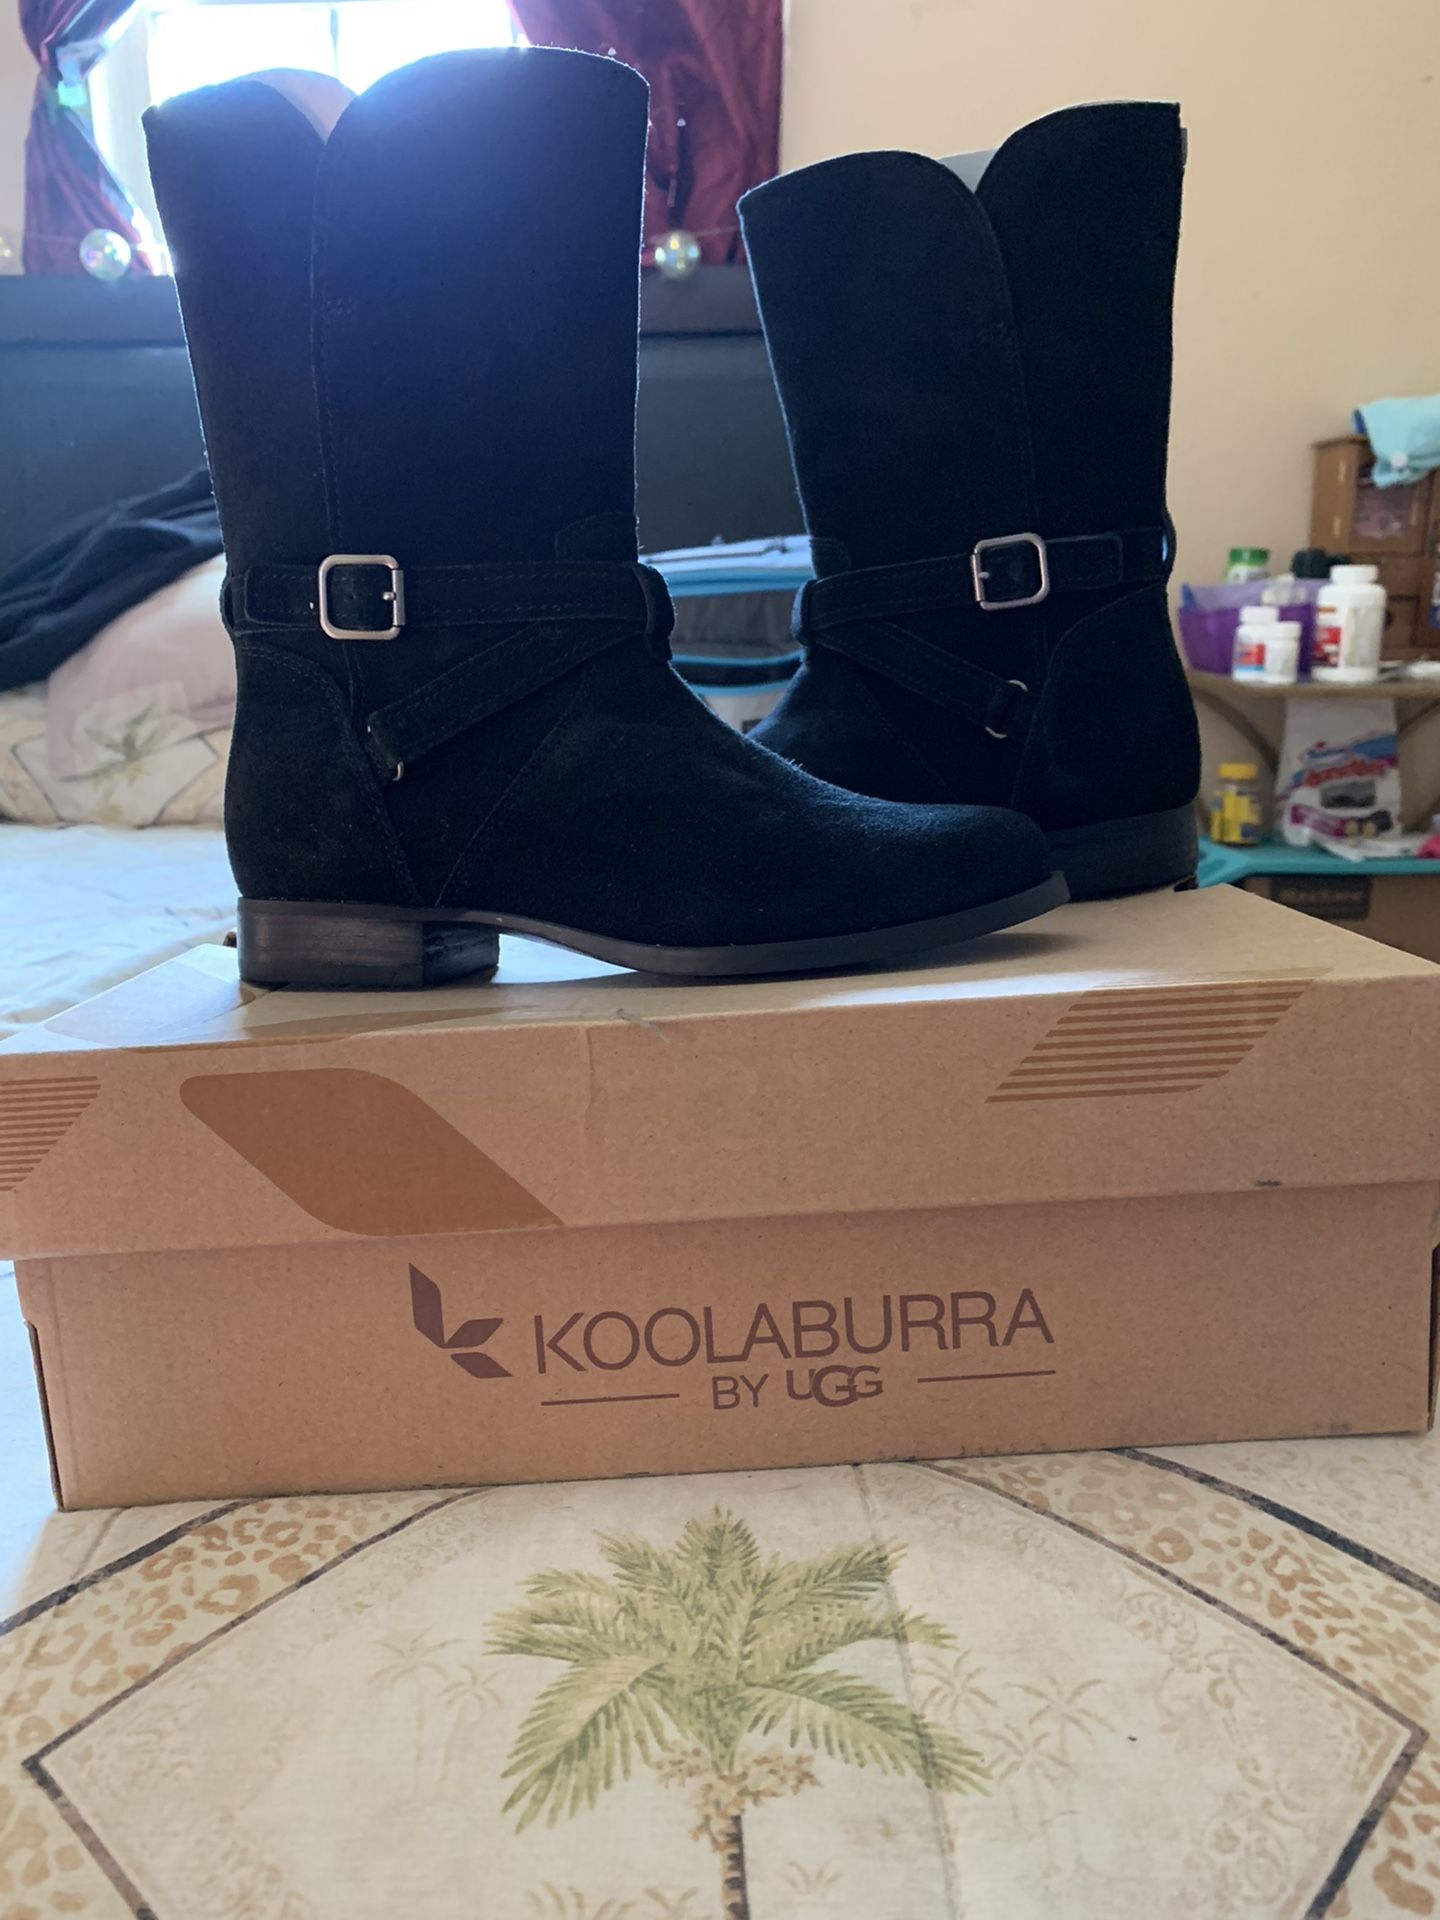 Jordan Sneakers And Ugg Boots